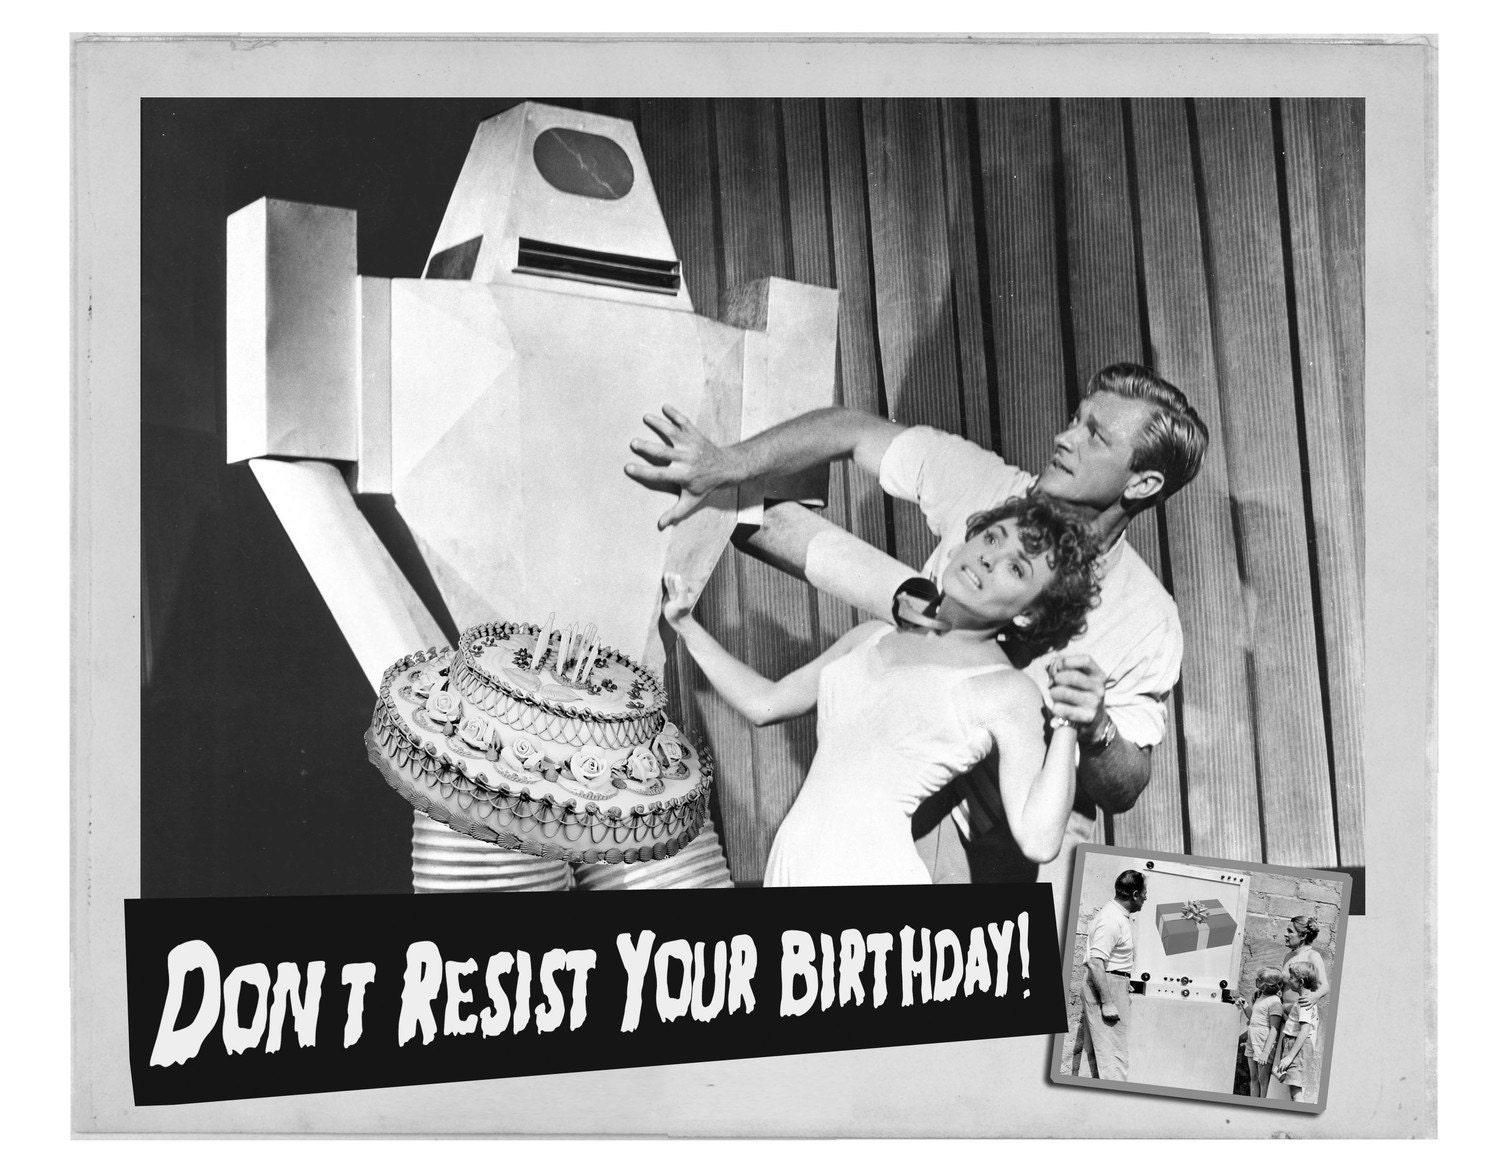 Birthday Card Robots Birthday Cards black and white Retro – Black and White Birthday Card